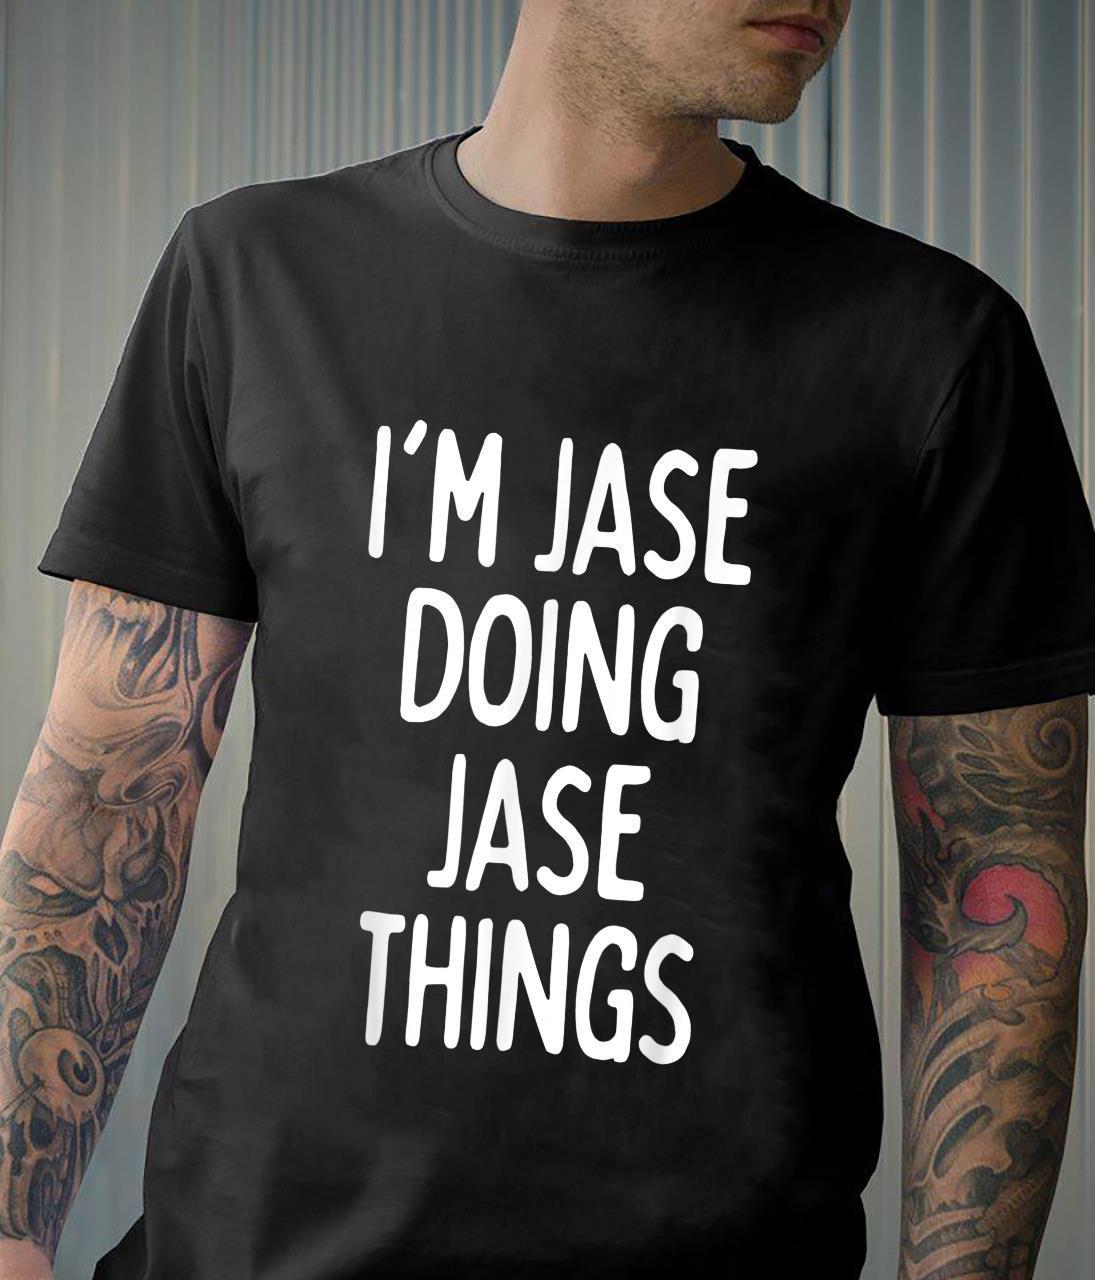 I'm Jase Doing Jase Things, First Name Shirt